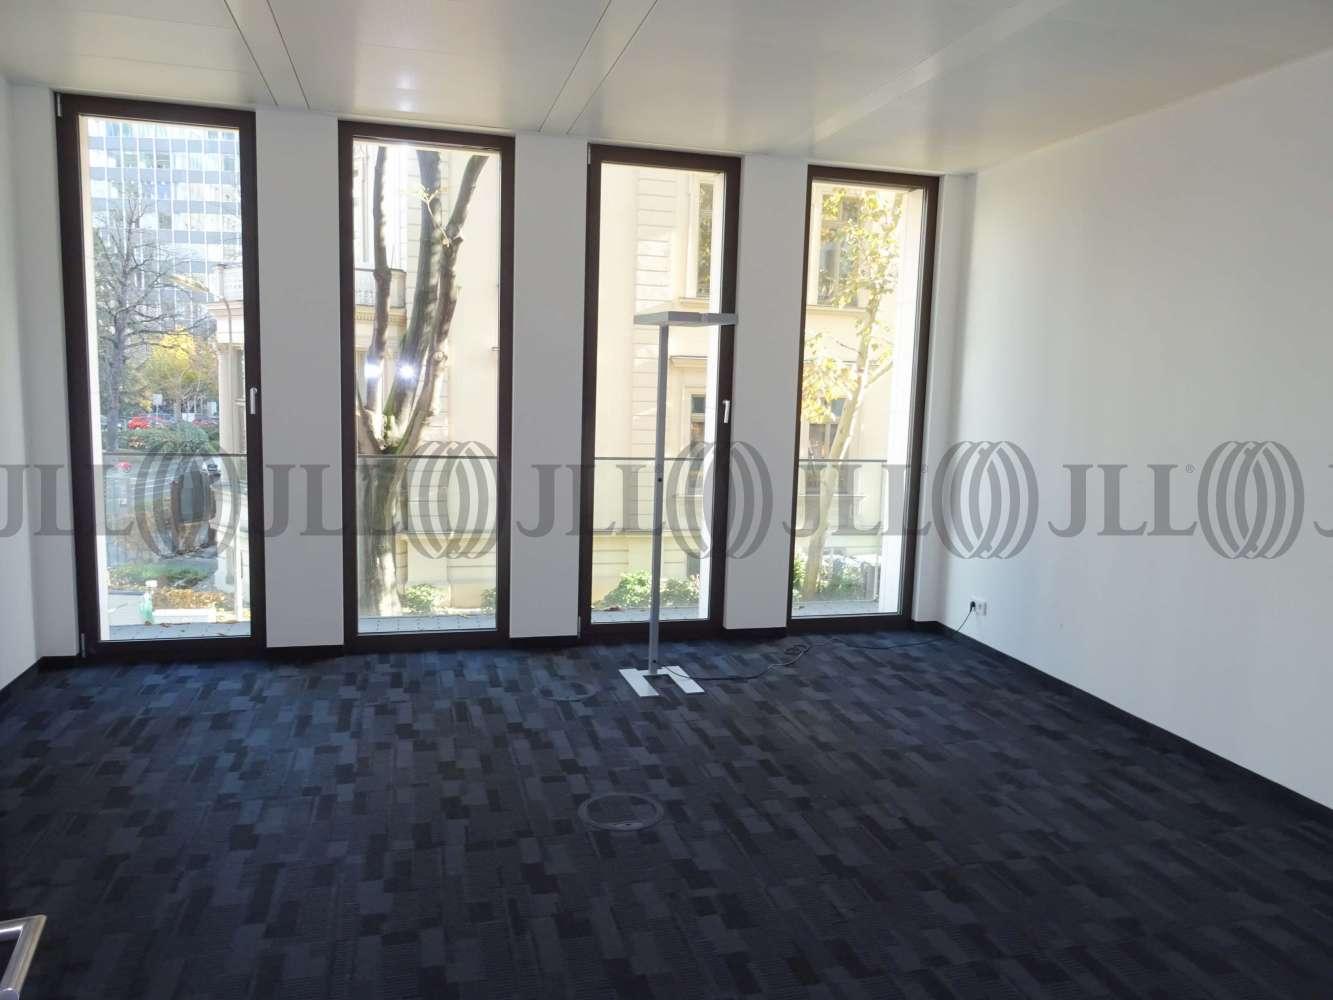 Büros Frankfurt am main, 60325 - Büro - Frankfurt am Main, Westend-Süd - F0187 - 9772747